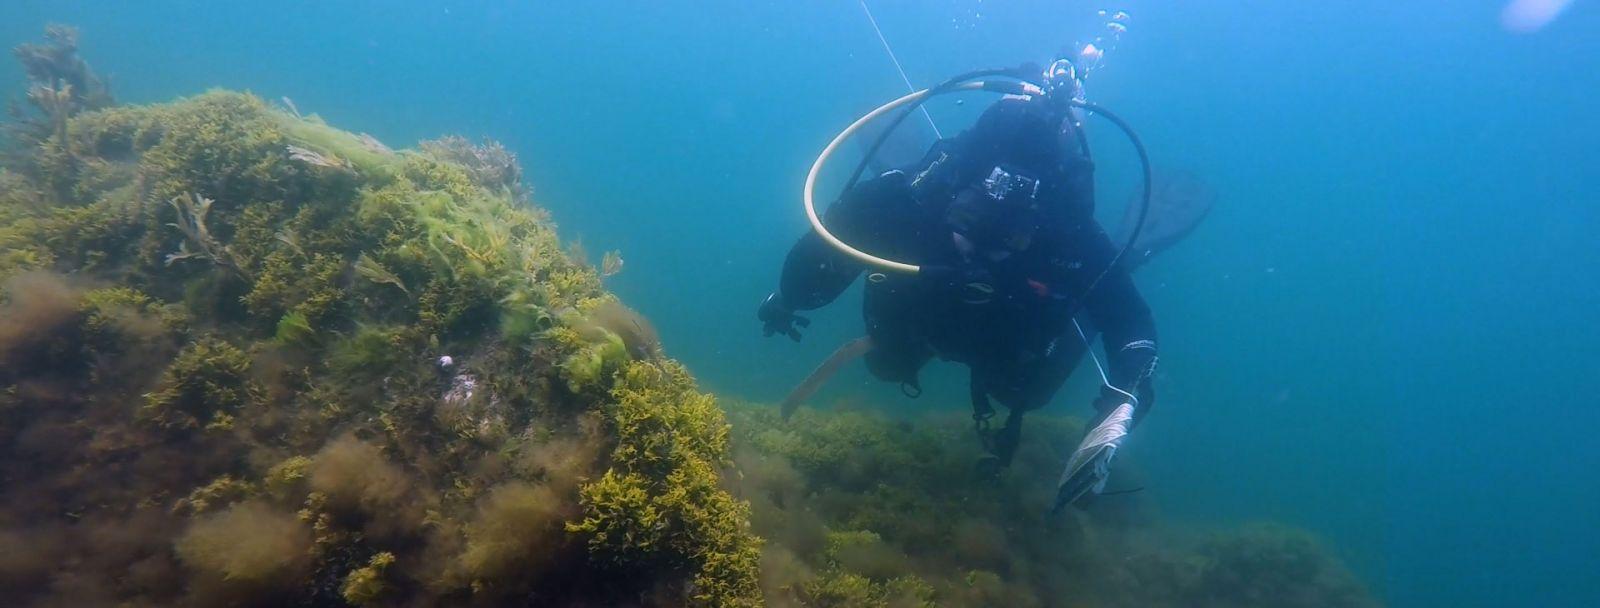 UNH Shoals Marine Lab divers